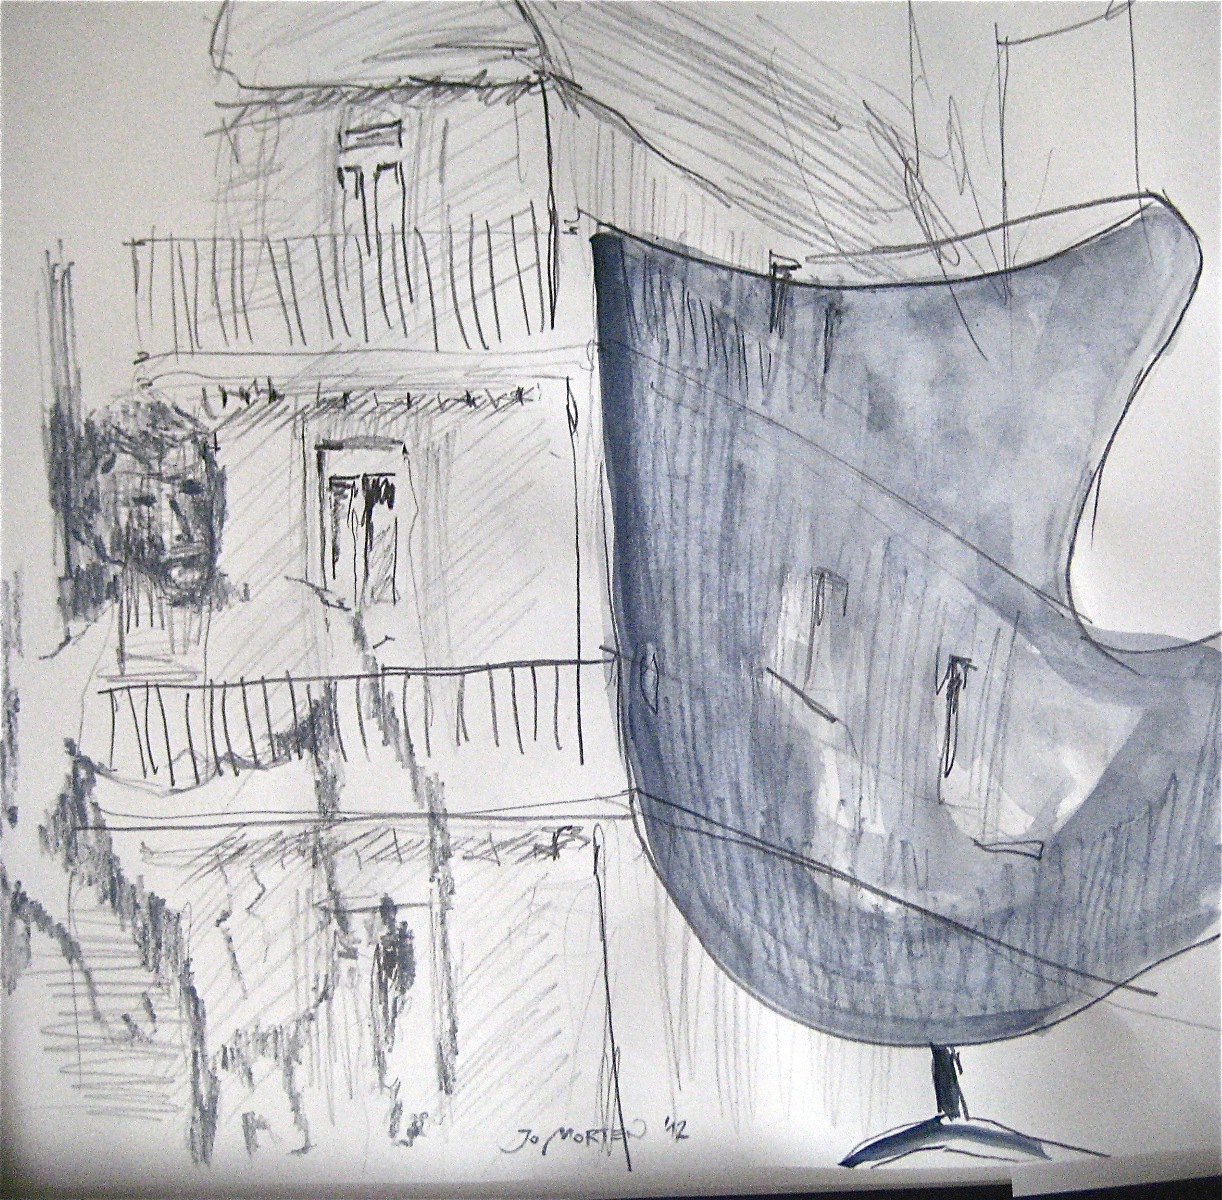 Betrachtet Zyklus: Die Zeit in Paris, Mischtechnik, 40x40cm, 2012